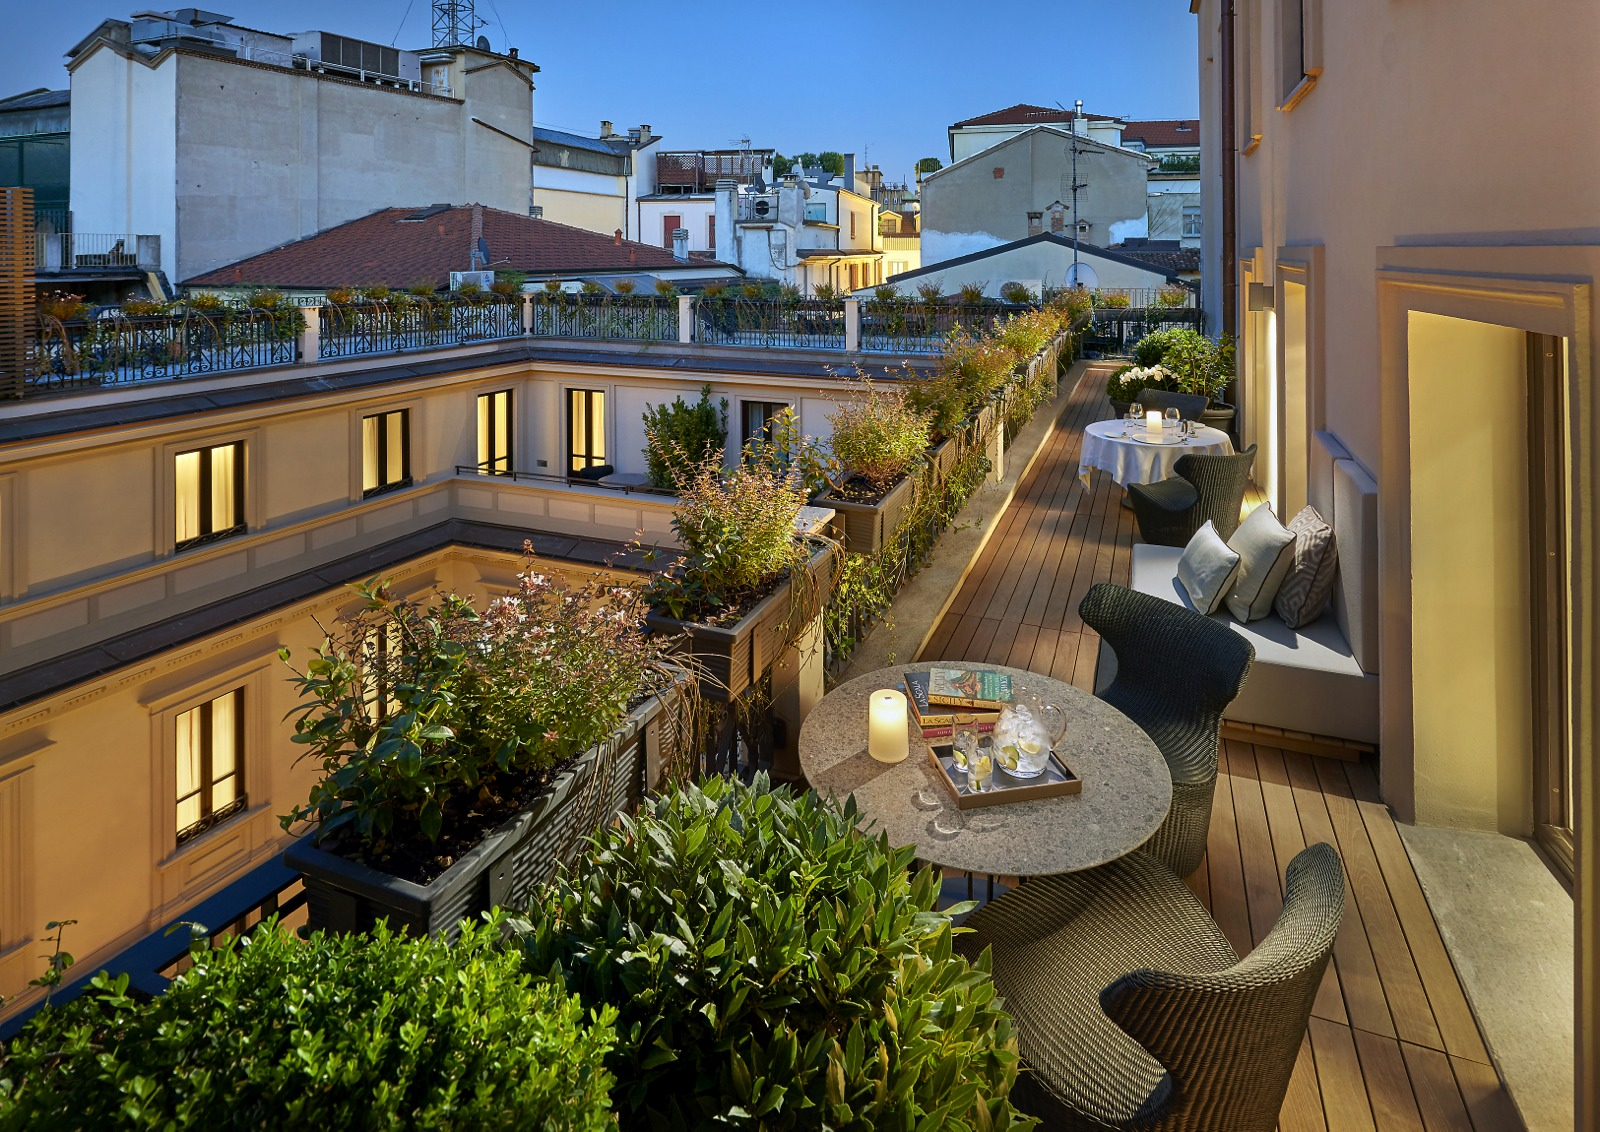 Mandarin oriental milan review gtspirit for Design hotel milano